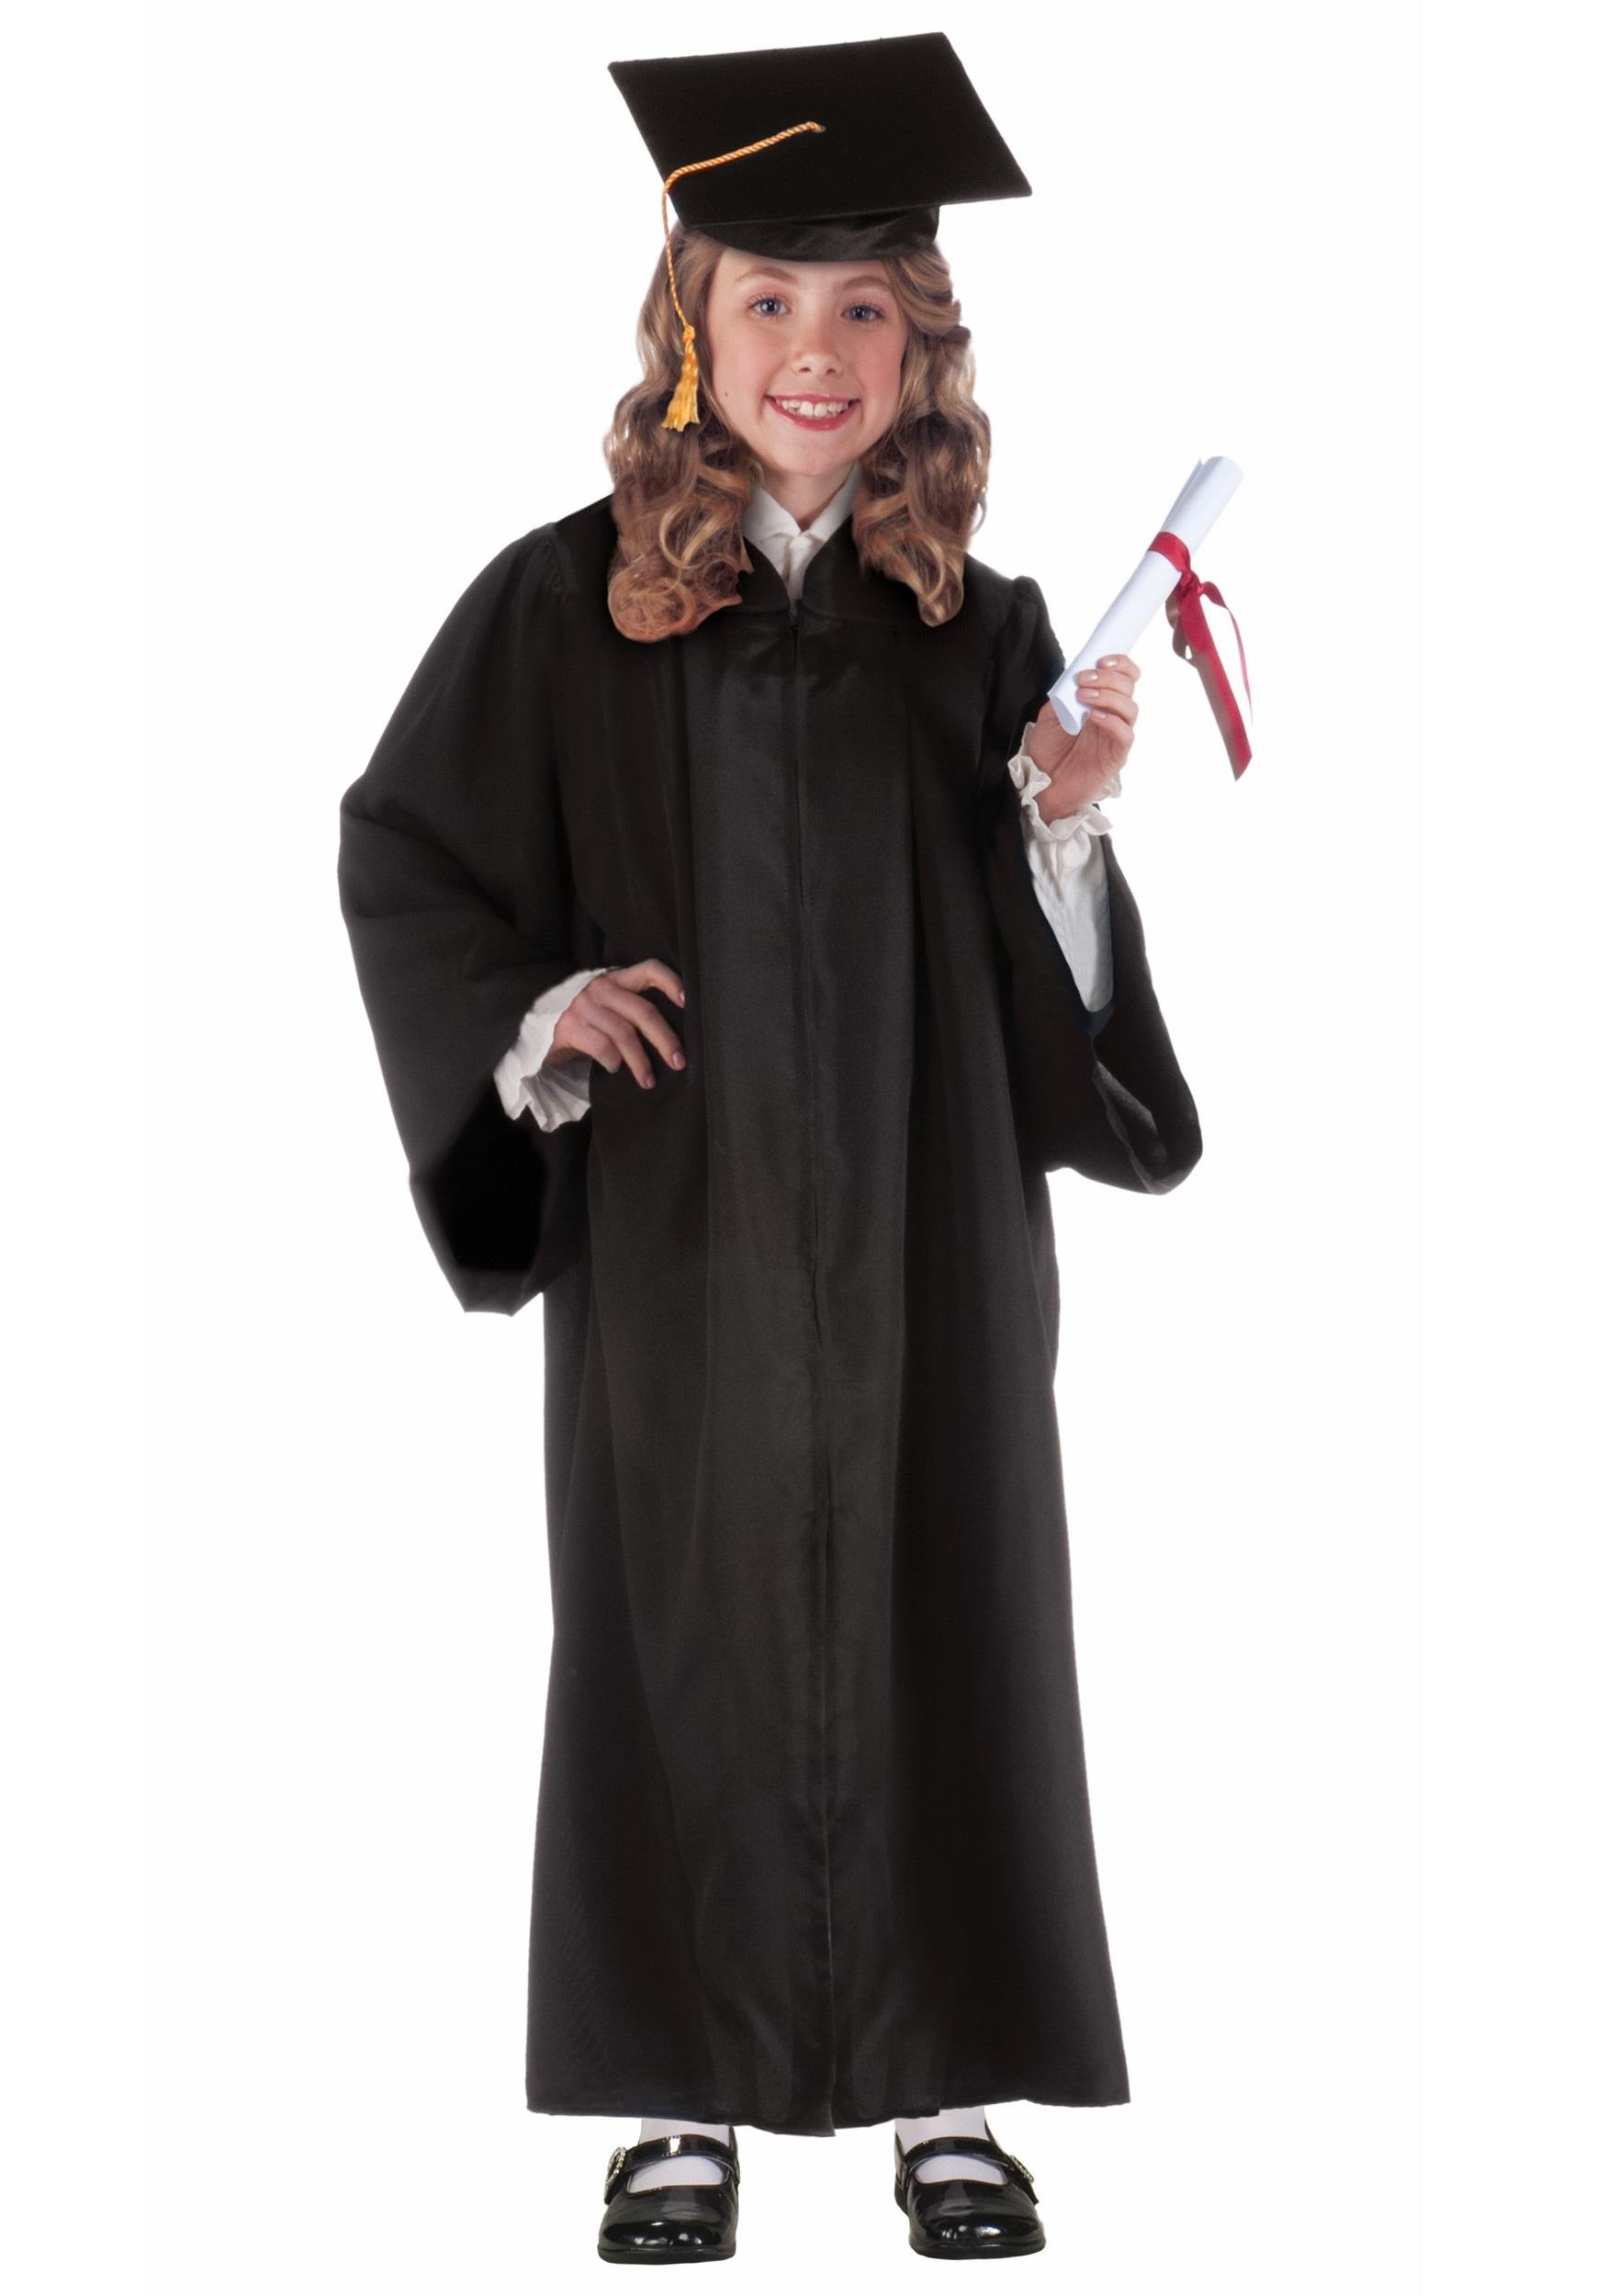 child-black-graduation-robe | kylegrant76